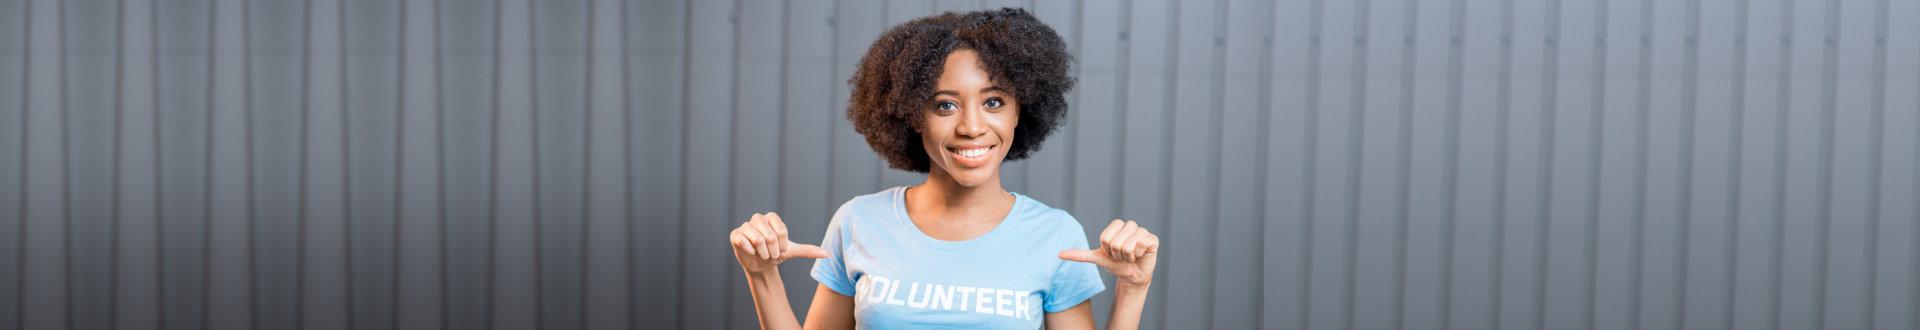 woman volunteering herself campaign program